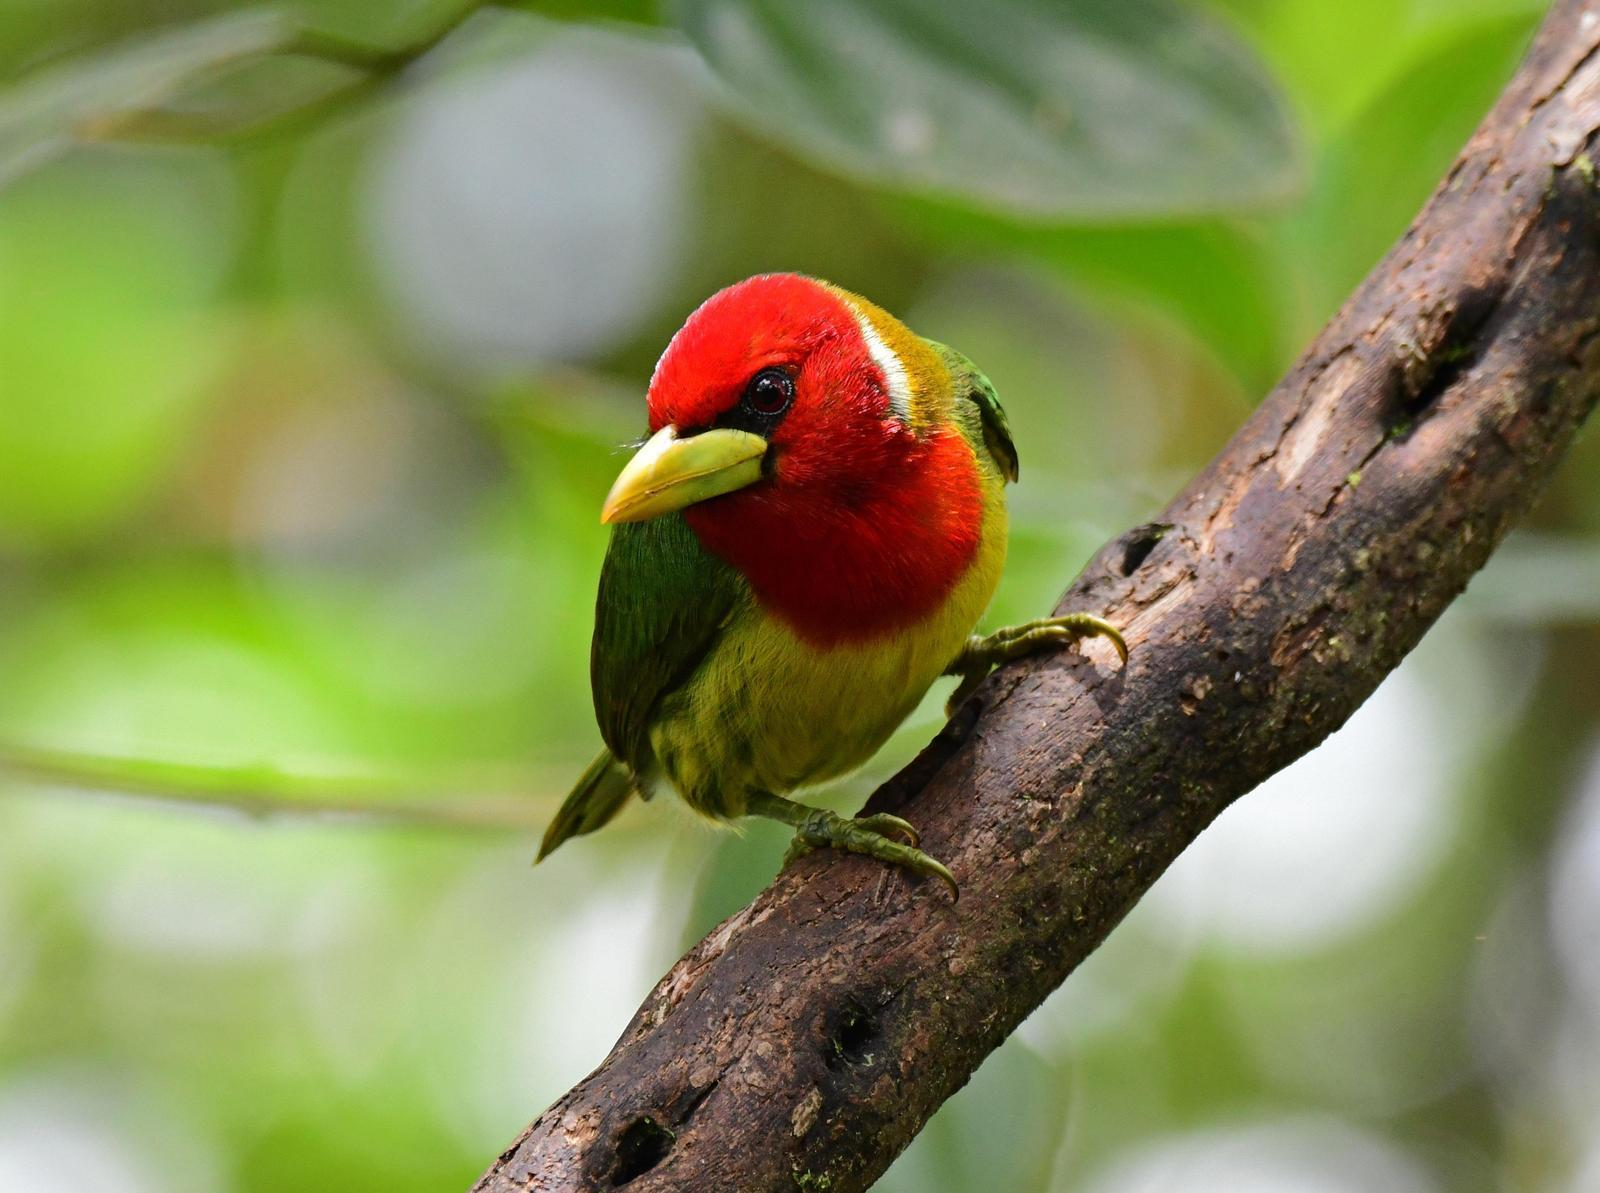 Red-headed Barbet Photo by Jacob Zadik